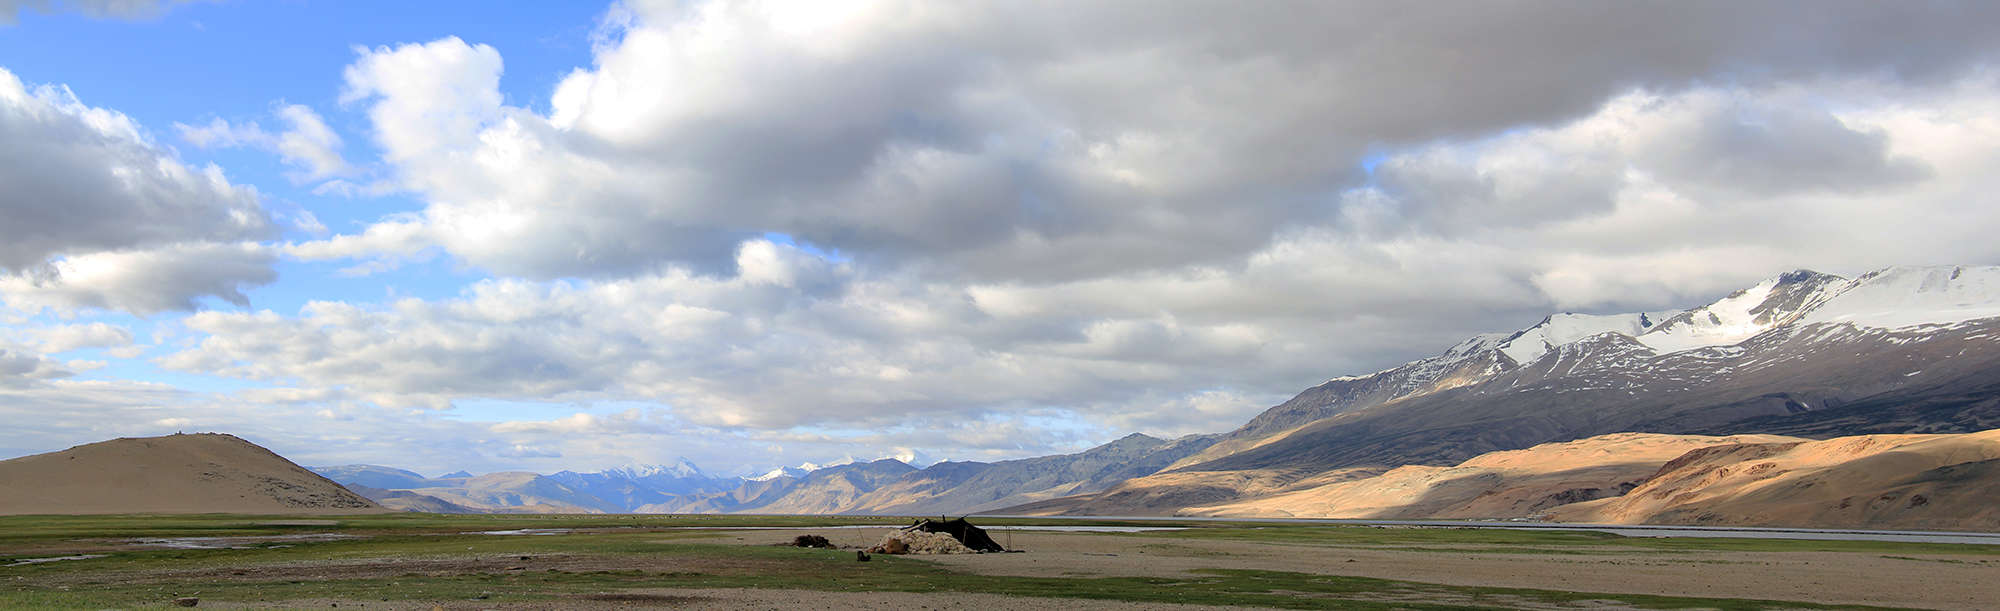 GHT India Treks - Tsho Moriri, Ladakh